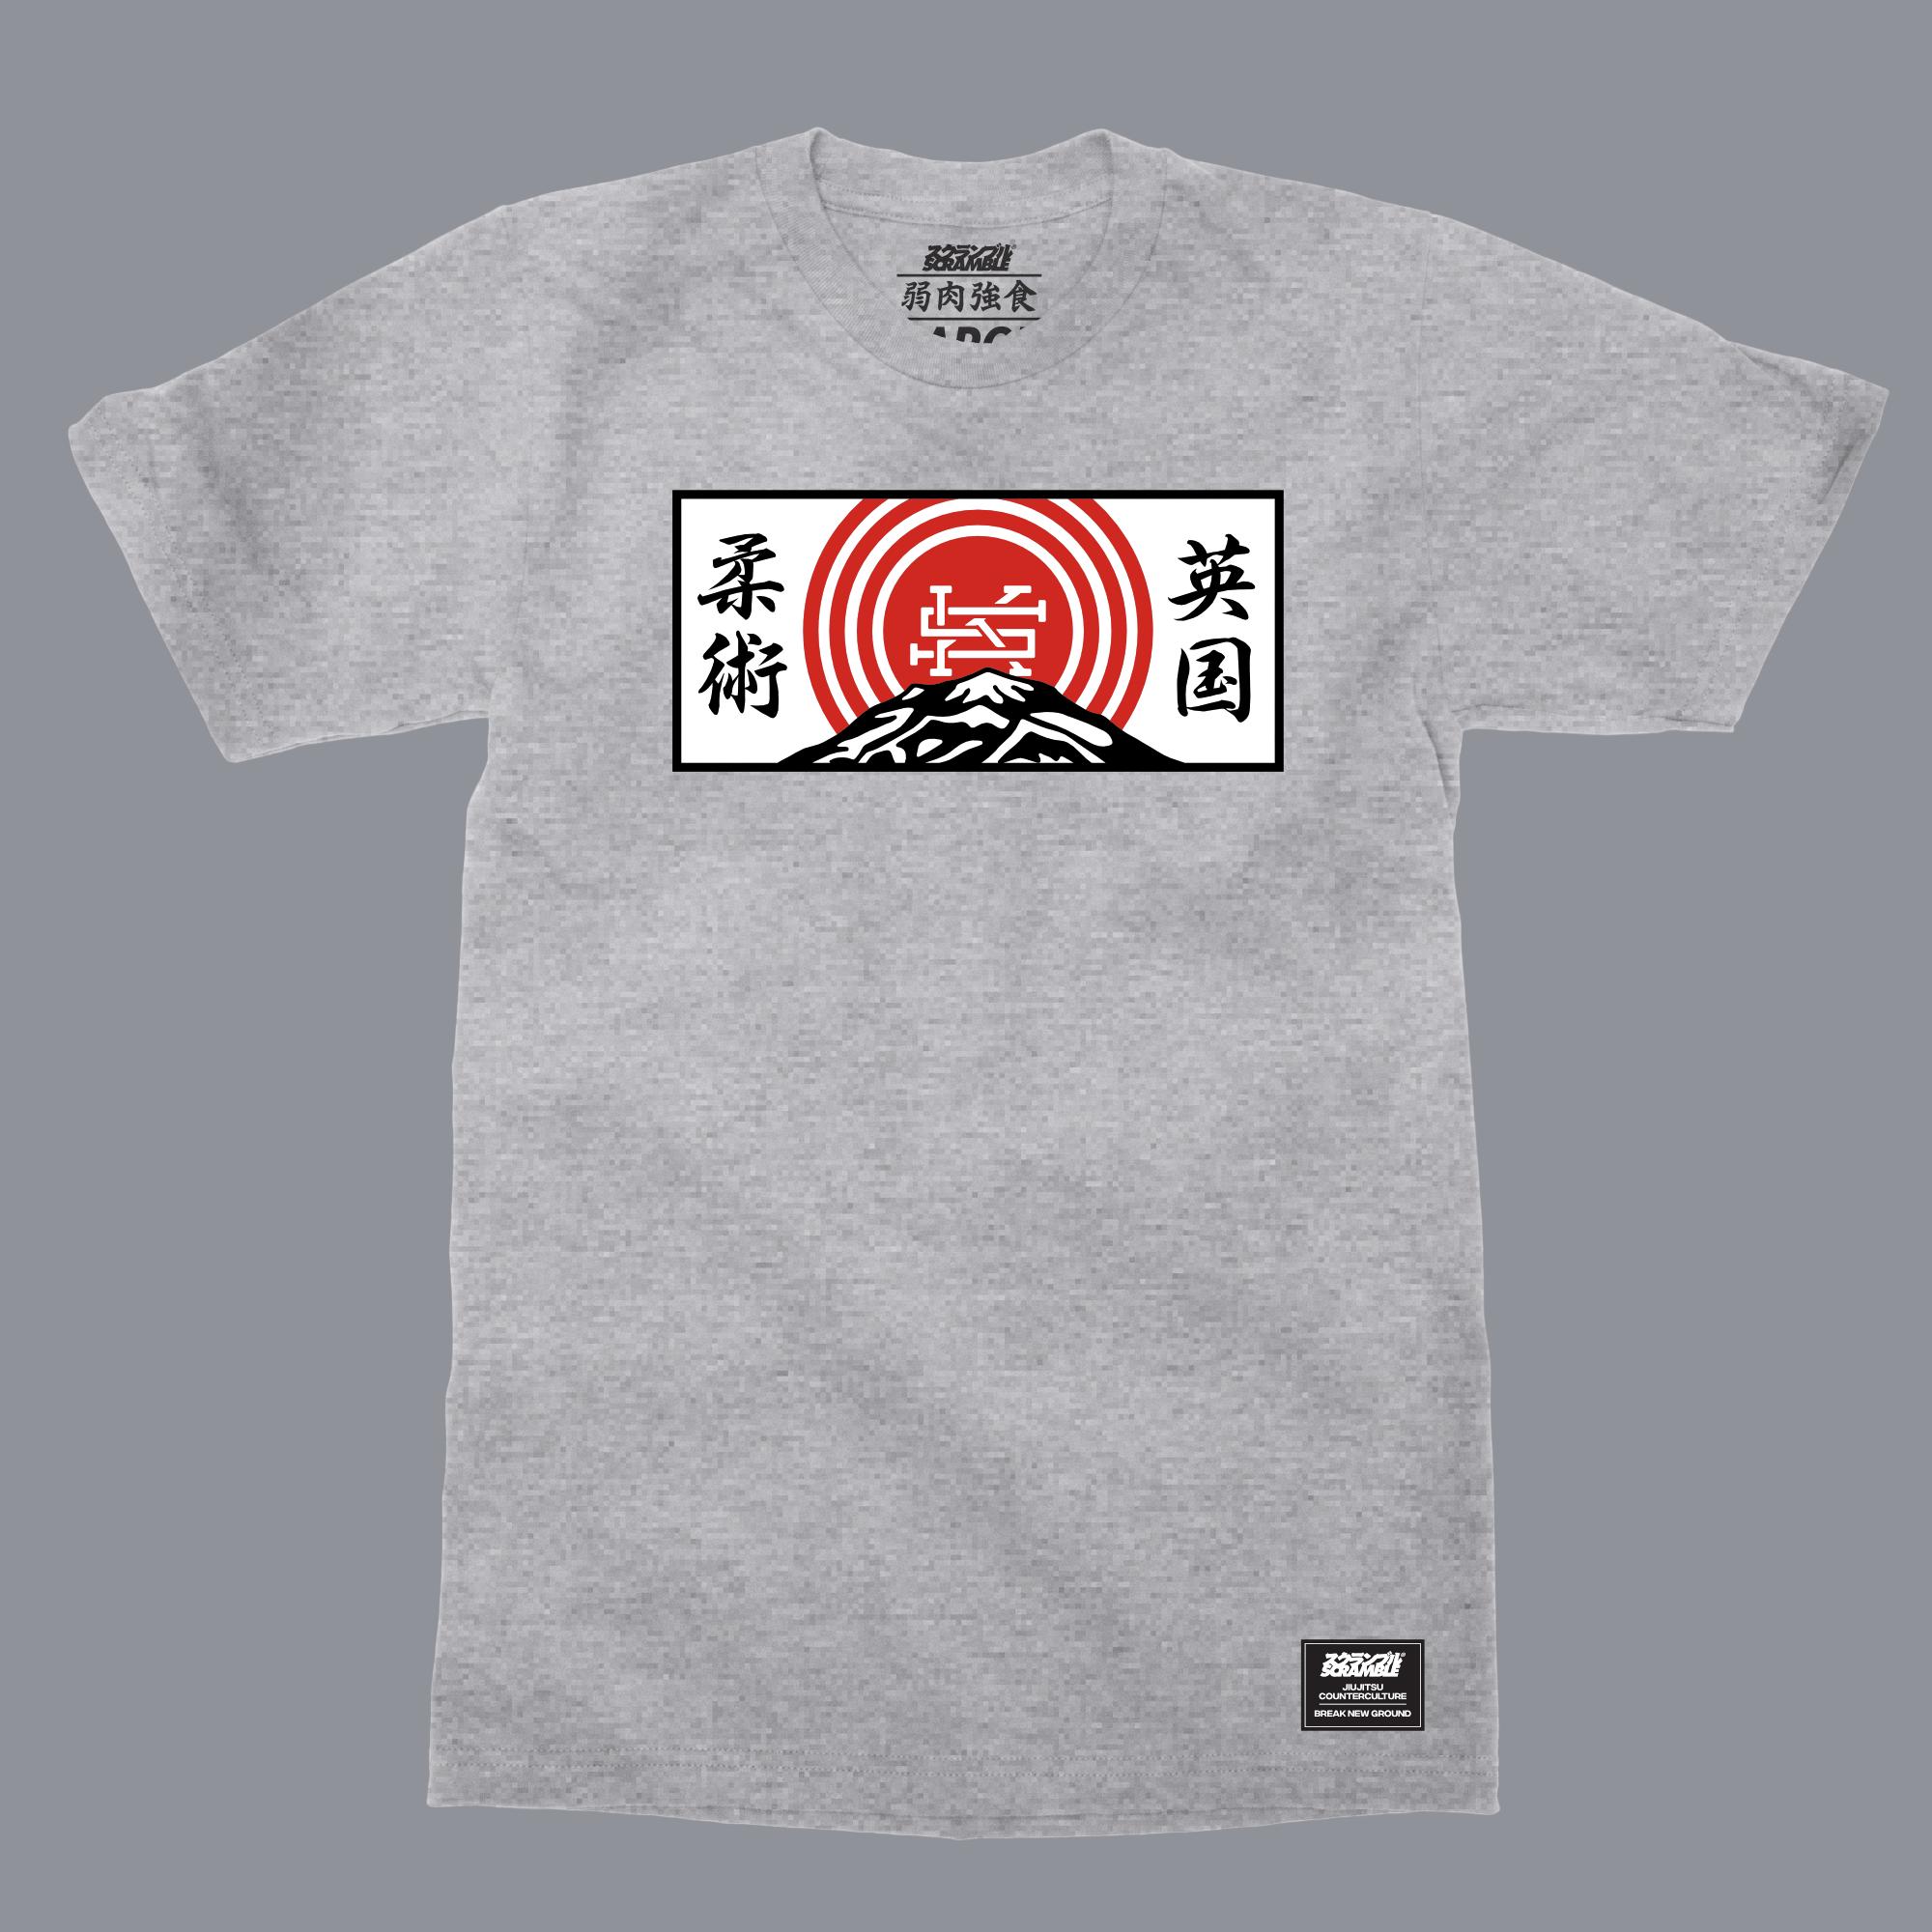 SCRAMBLE MOUNTAIN T-SHIRT グレイ|格闘技 柔術Tシャツ